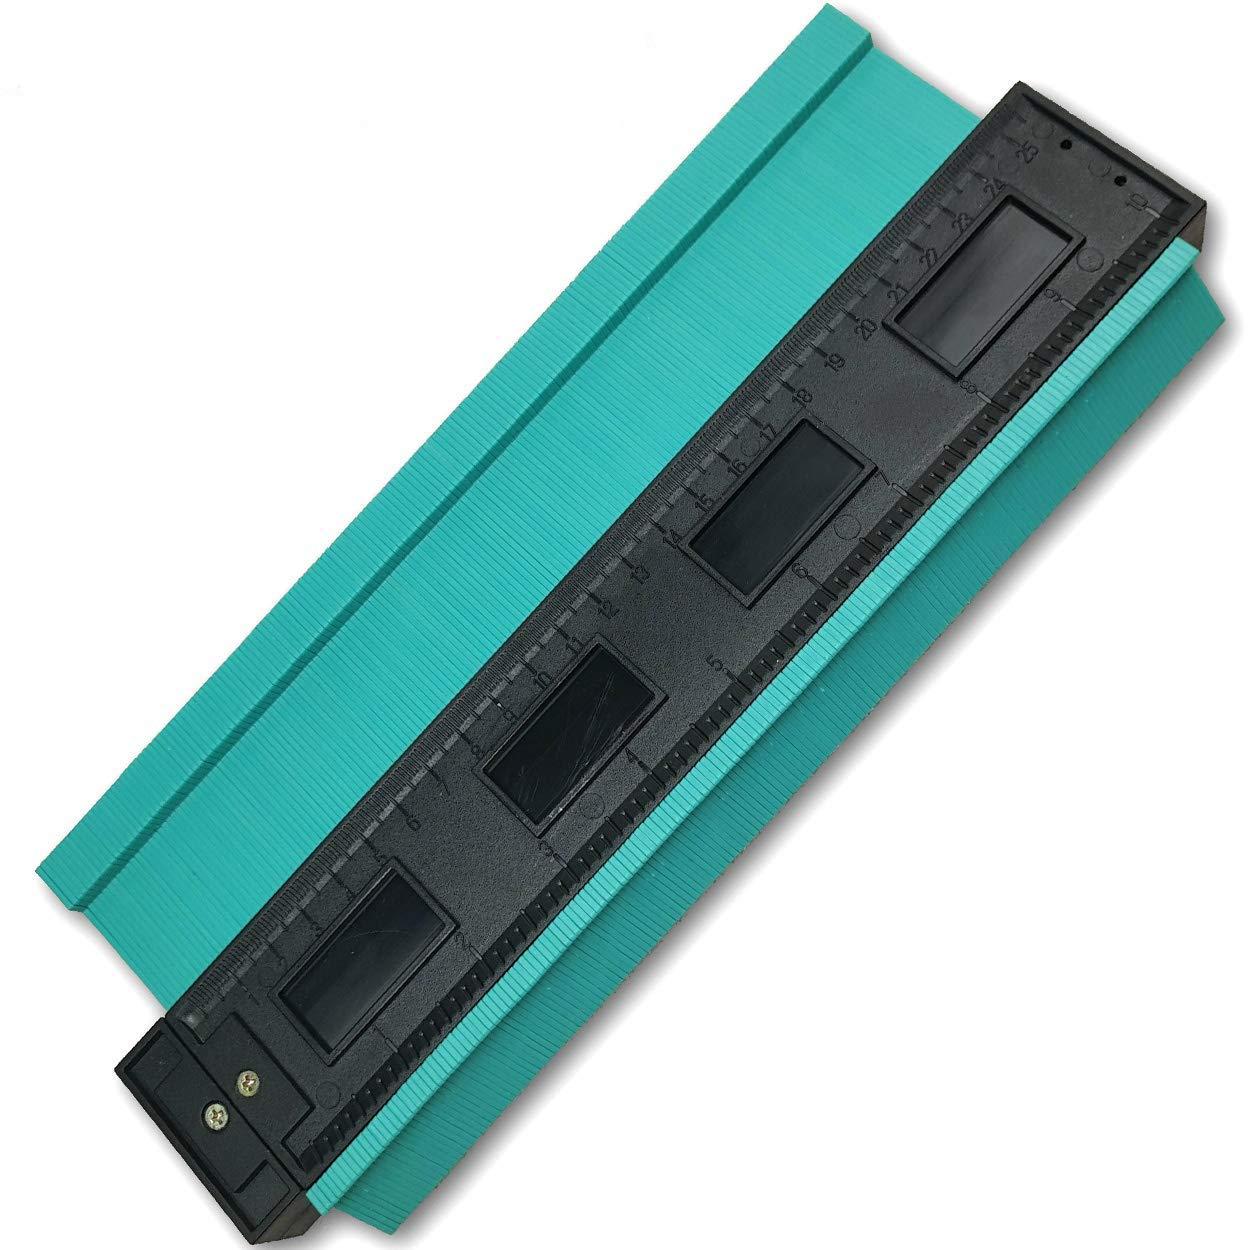 10 Inch Contour Gauge Irregular Profile Gauge Duplicator Tiling Laminate Tiles Edge Shaping Wood Measure Ruler Plastic Woodworking Tools Profile Jig Guide